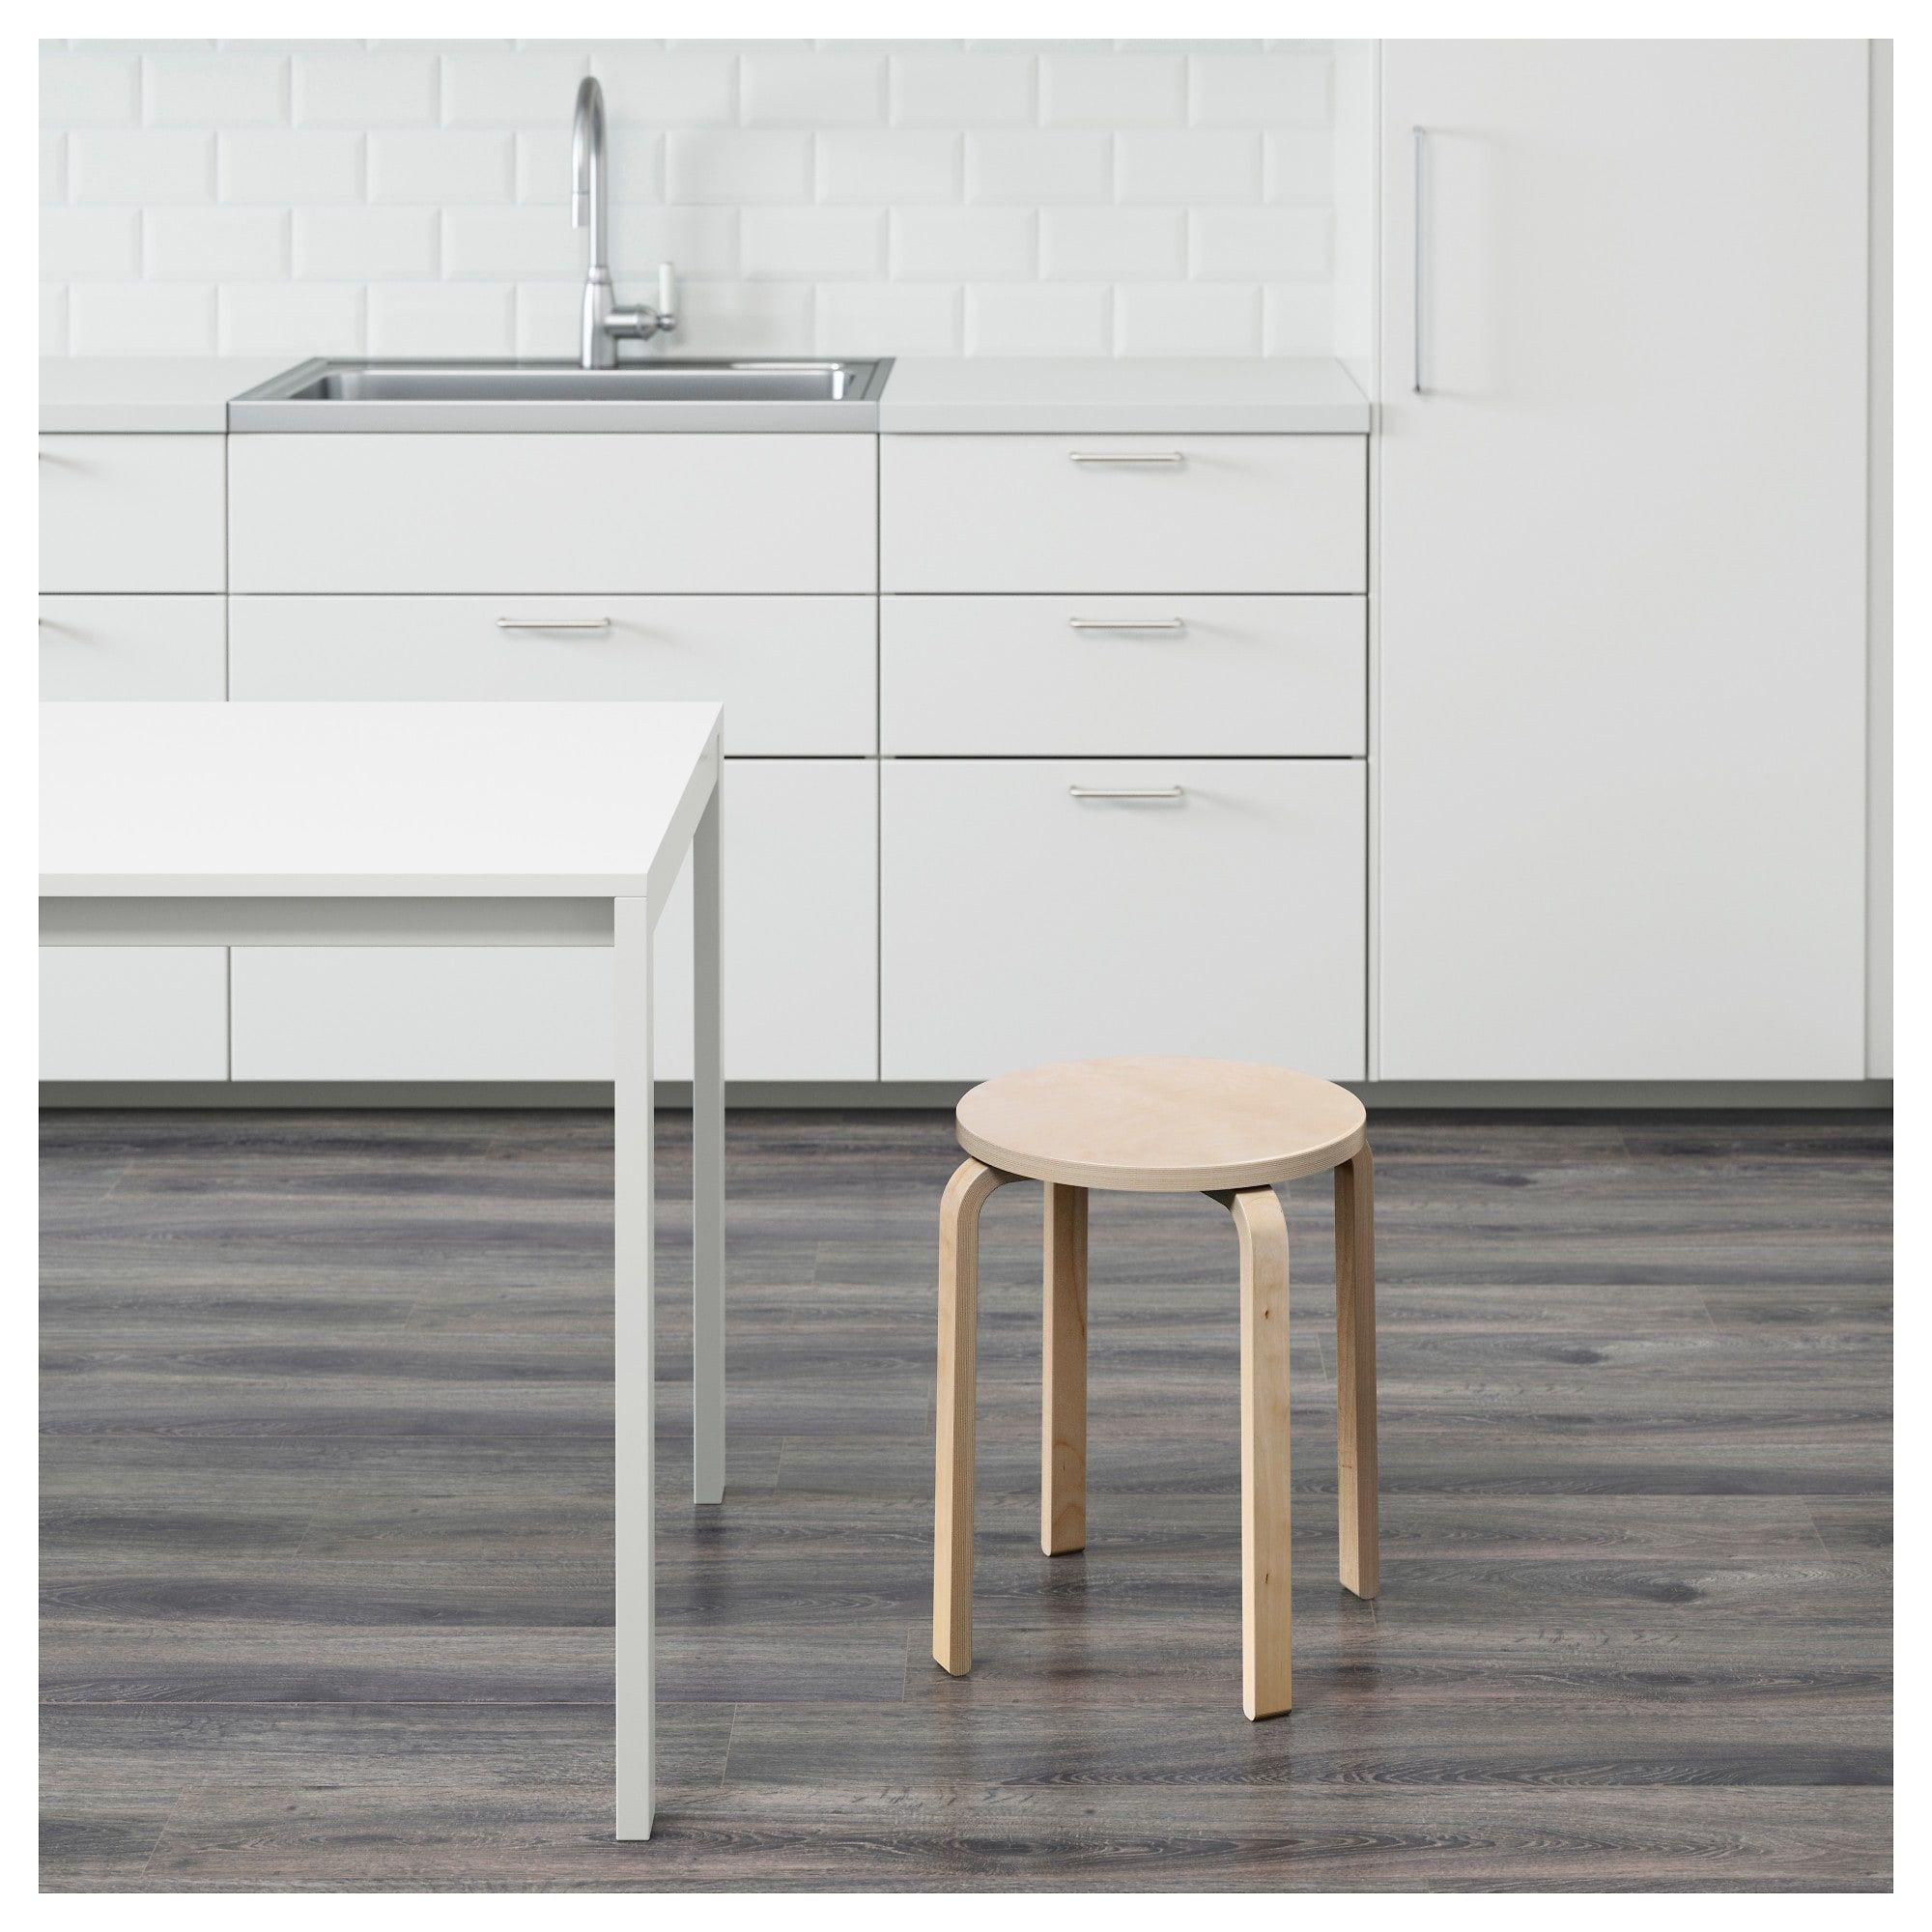 Australia Dining room chairs modern, Stool, Ikea